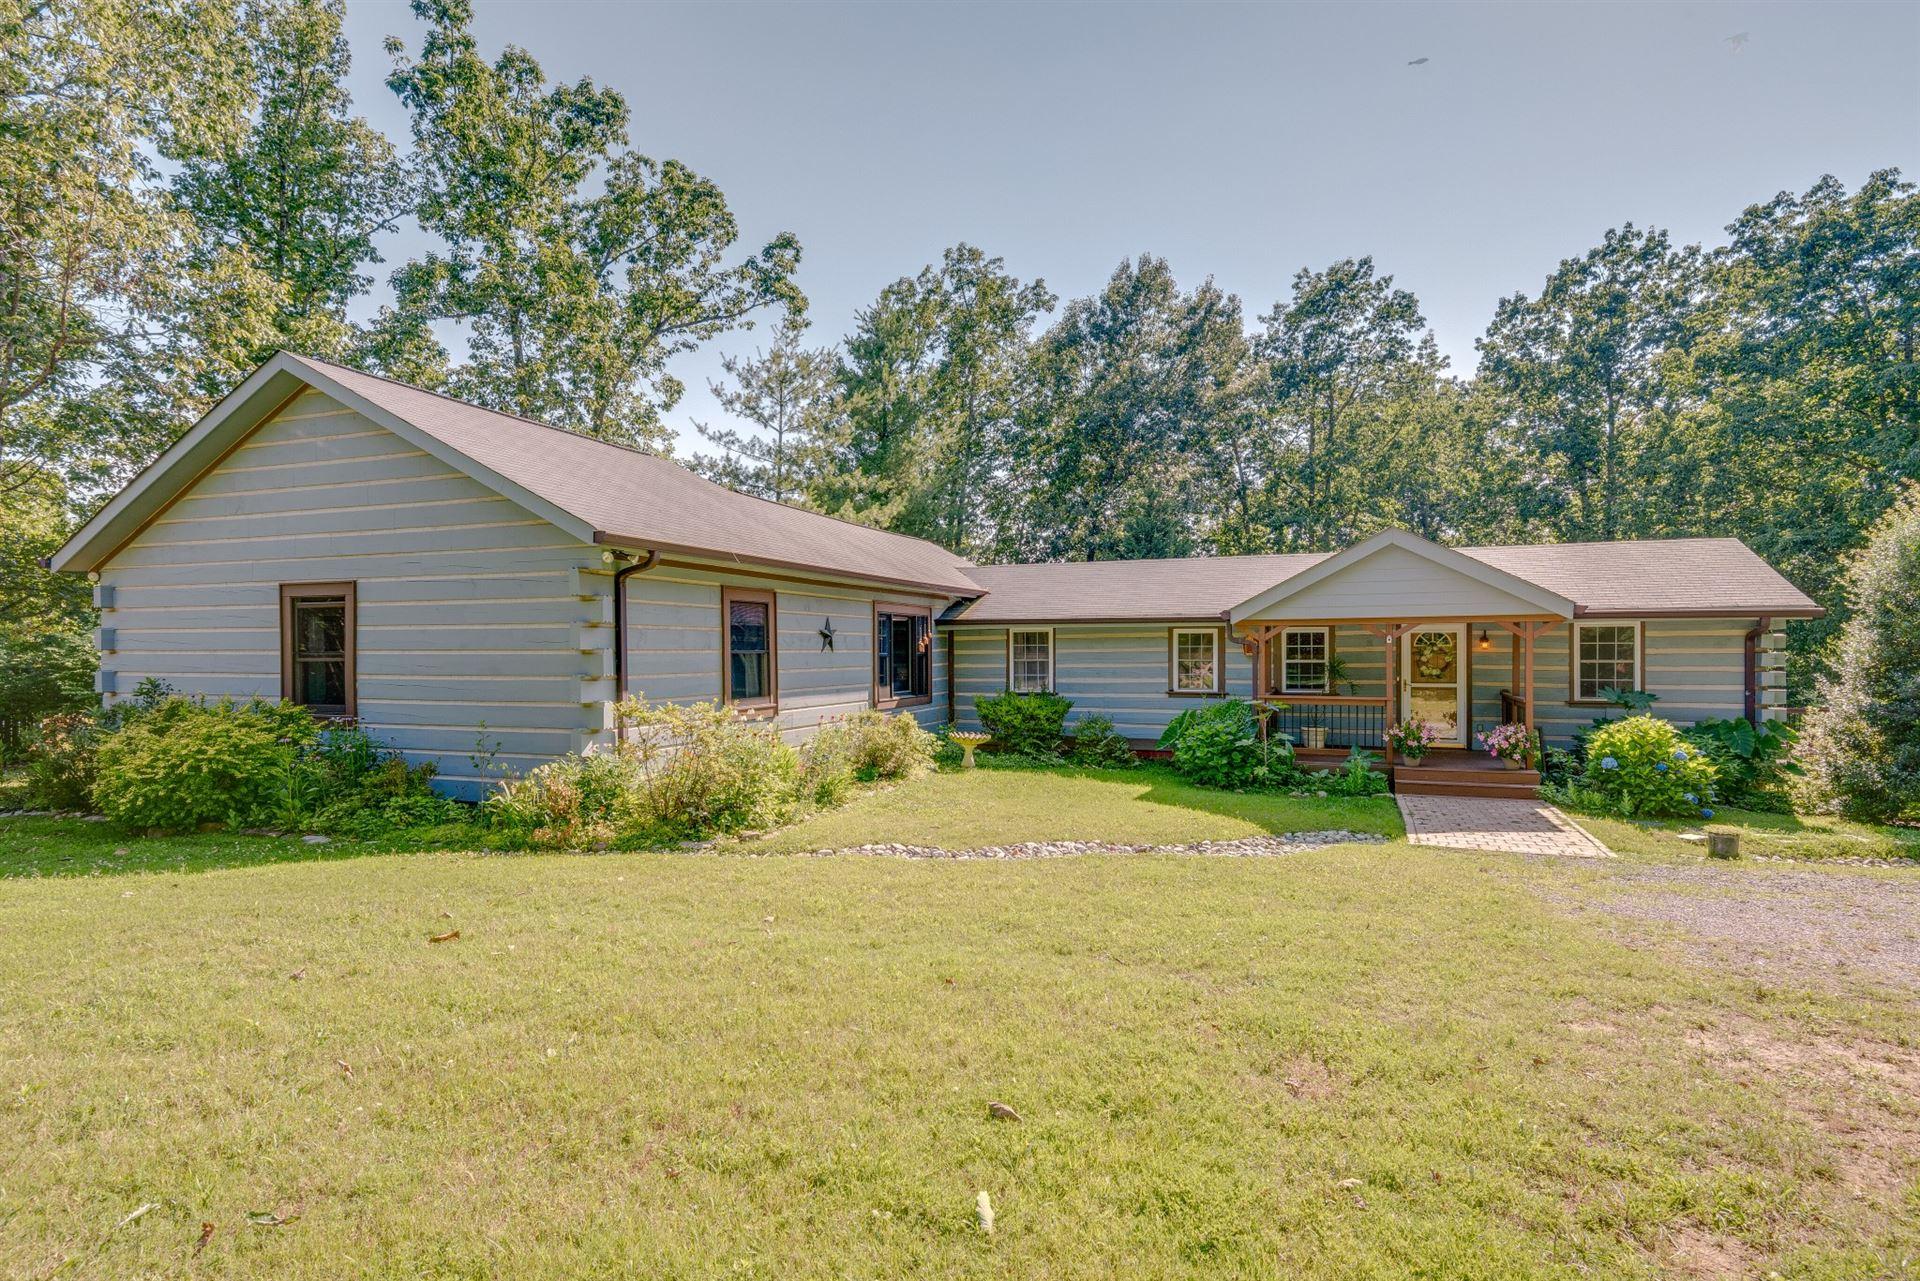 5298 Old Sams Creek Rd, Pegram, TN 37143 - MLS#: 2166502